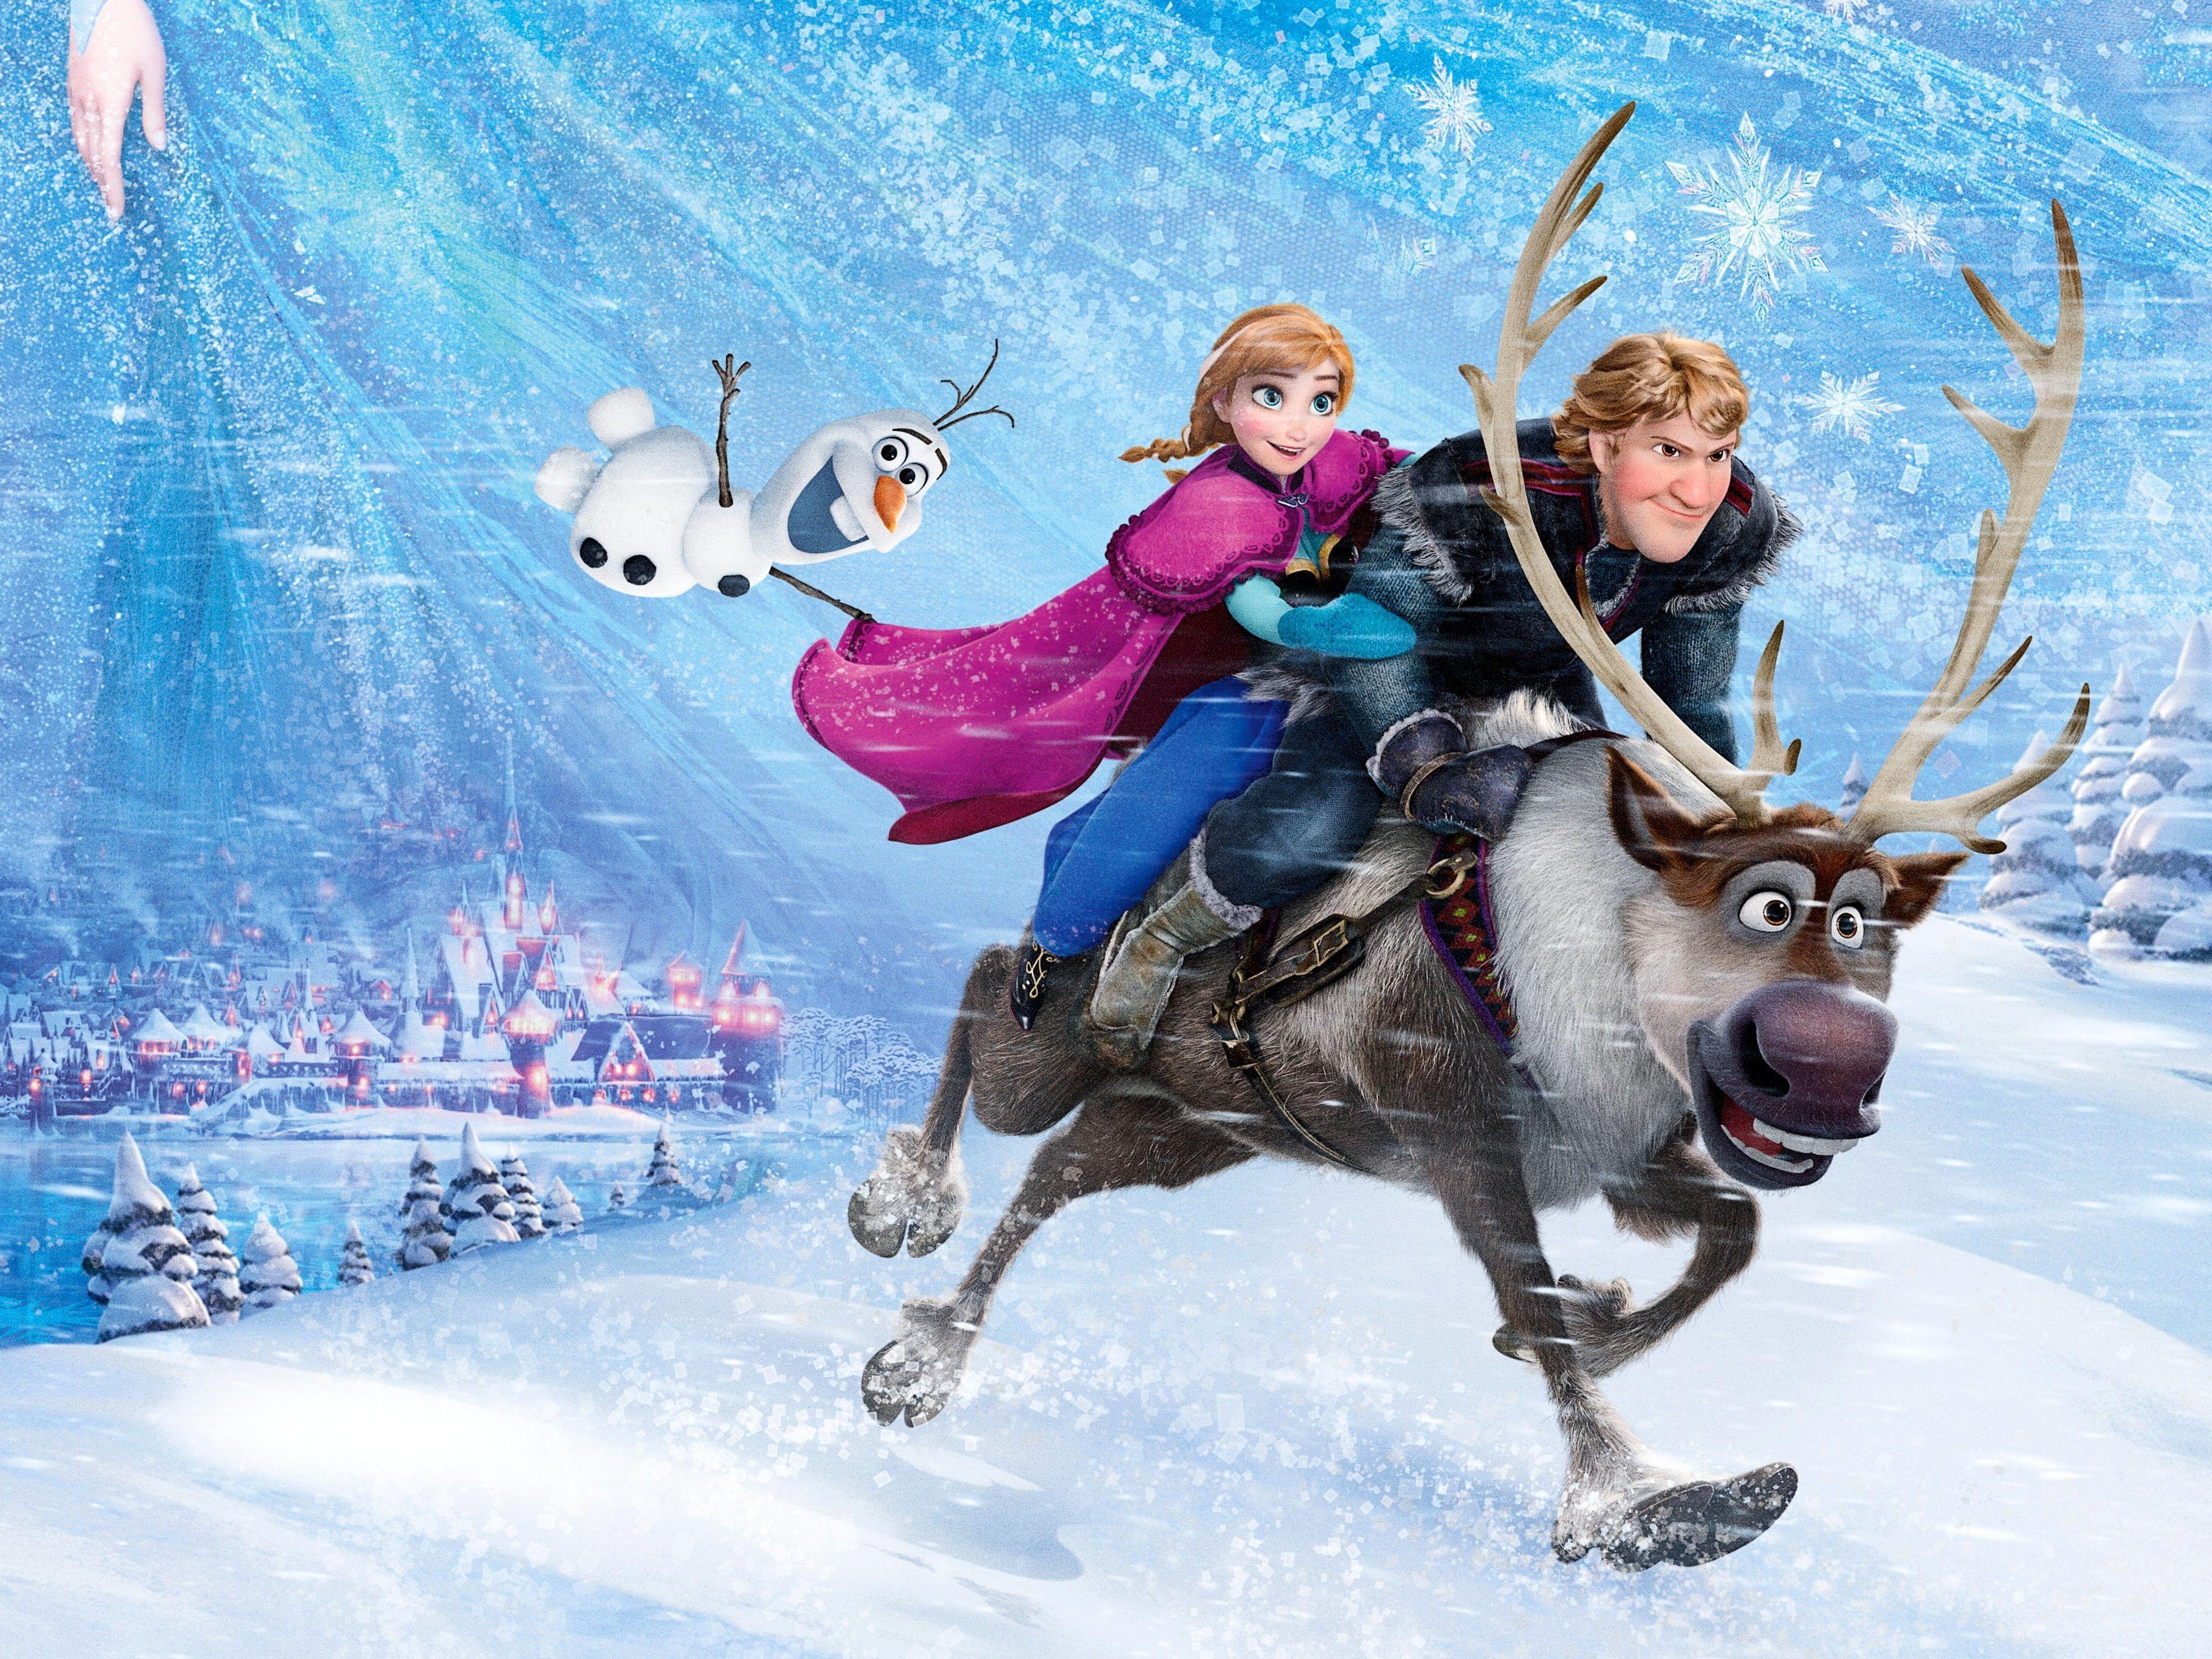 Disney Frozen Poster Snow Snowflakes The City Ice Deer Snowman Frozen Princess Kingdom Anna Anna Walt Frozen Poster Frozen Disney Movie Disney Frozen